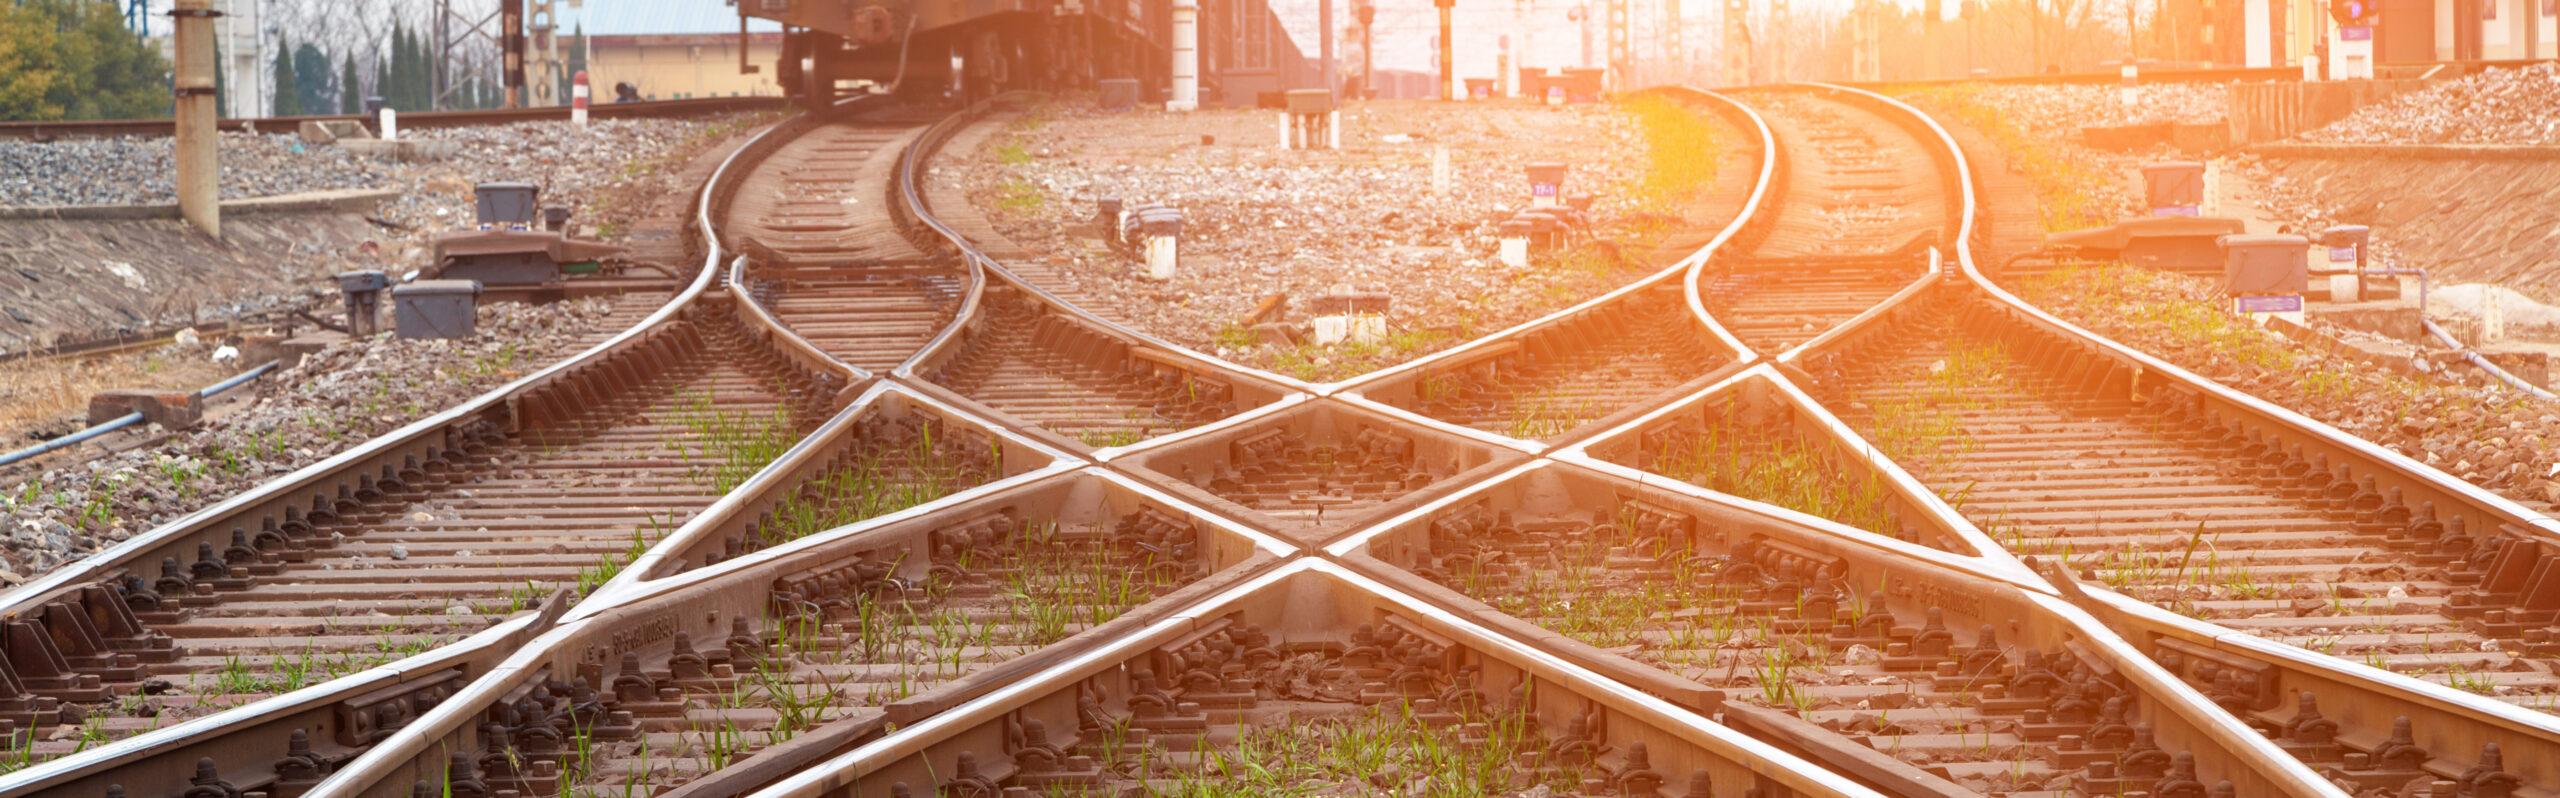 NRL Group - Rail business news